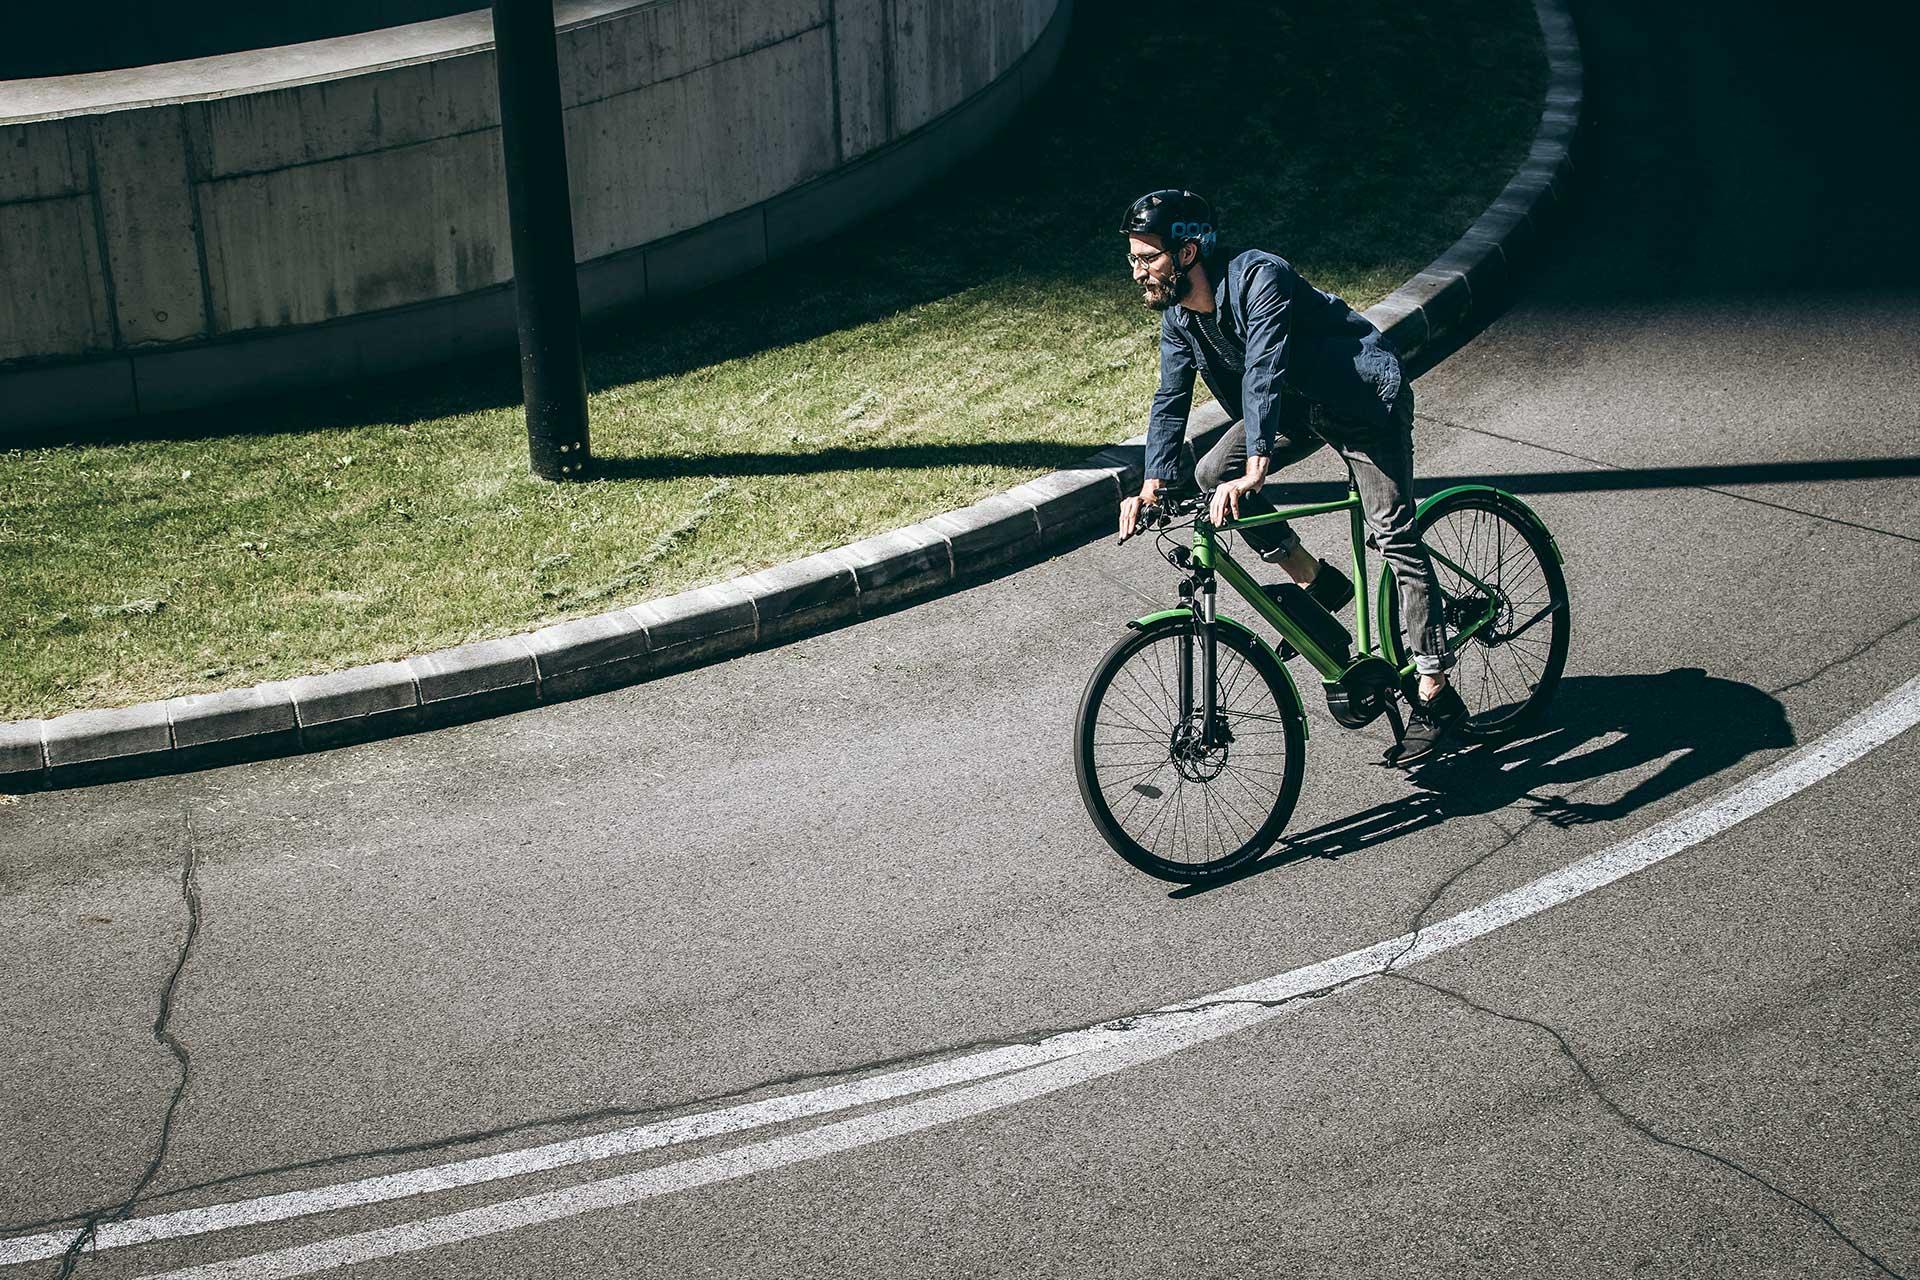 Fotograf Fahrradfahrer Ebike Lifestyle Sport Urban Kampagne Wien